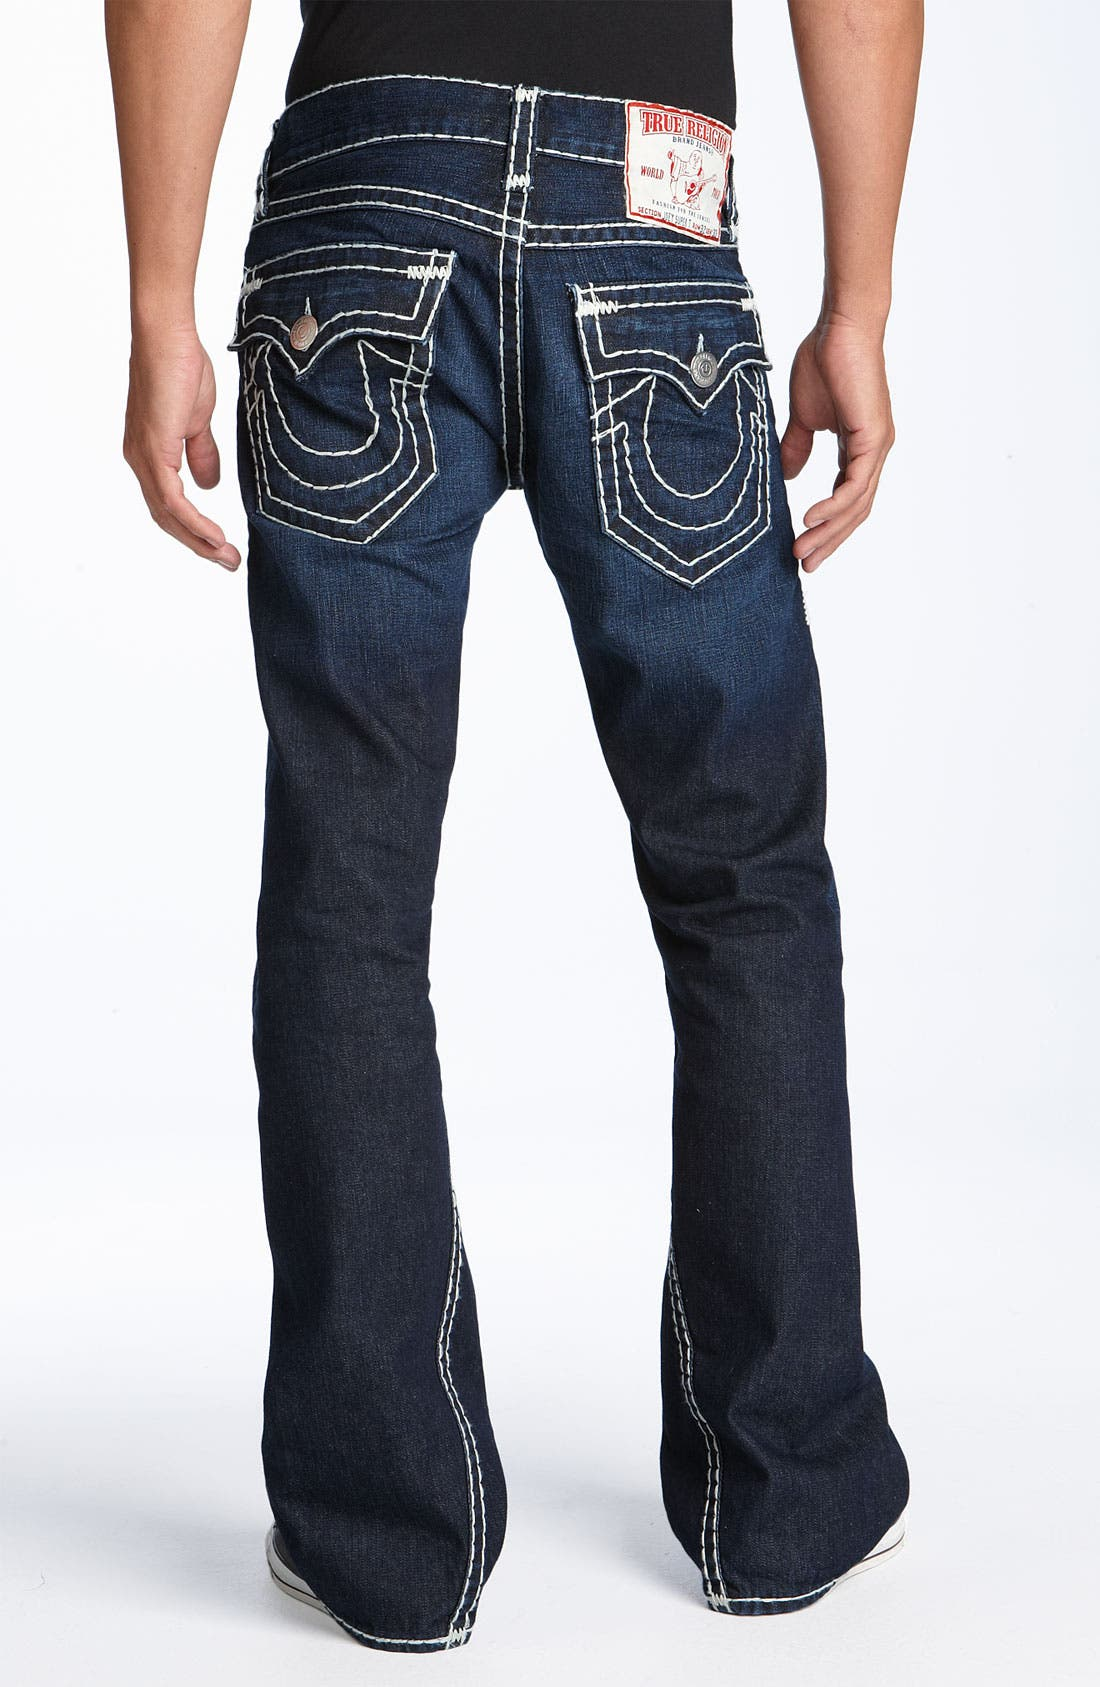 TRUE RELIGION BRAND JEANS 'Joey - Super T' Bootcut Jeans, Main, color, 400